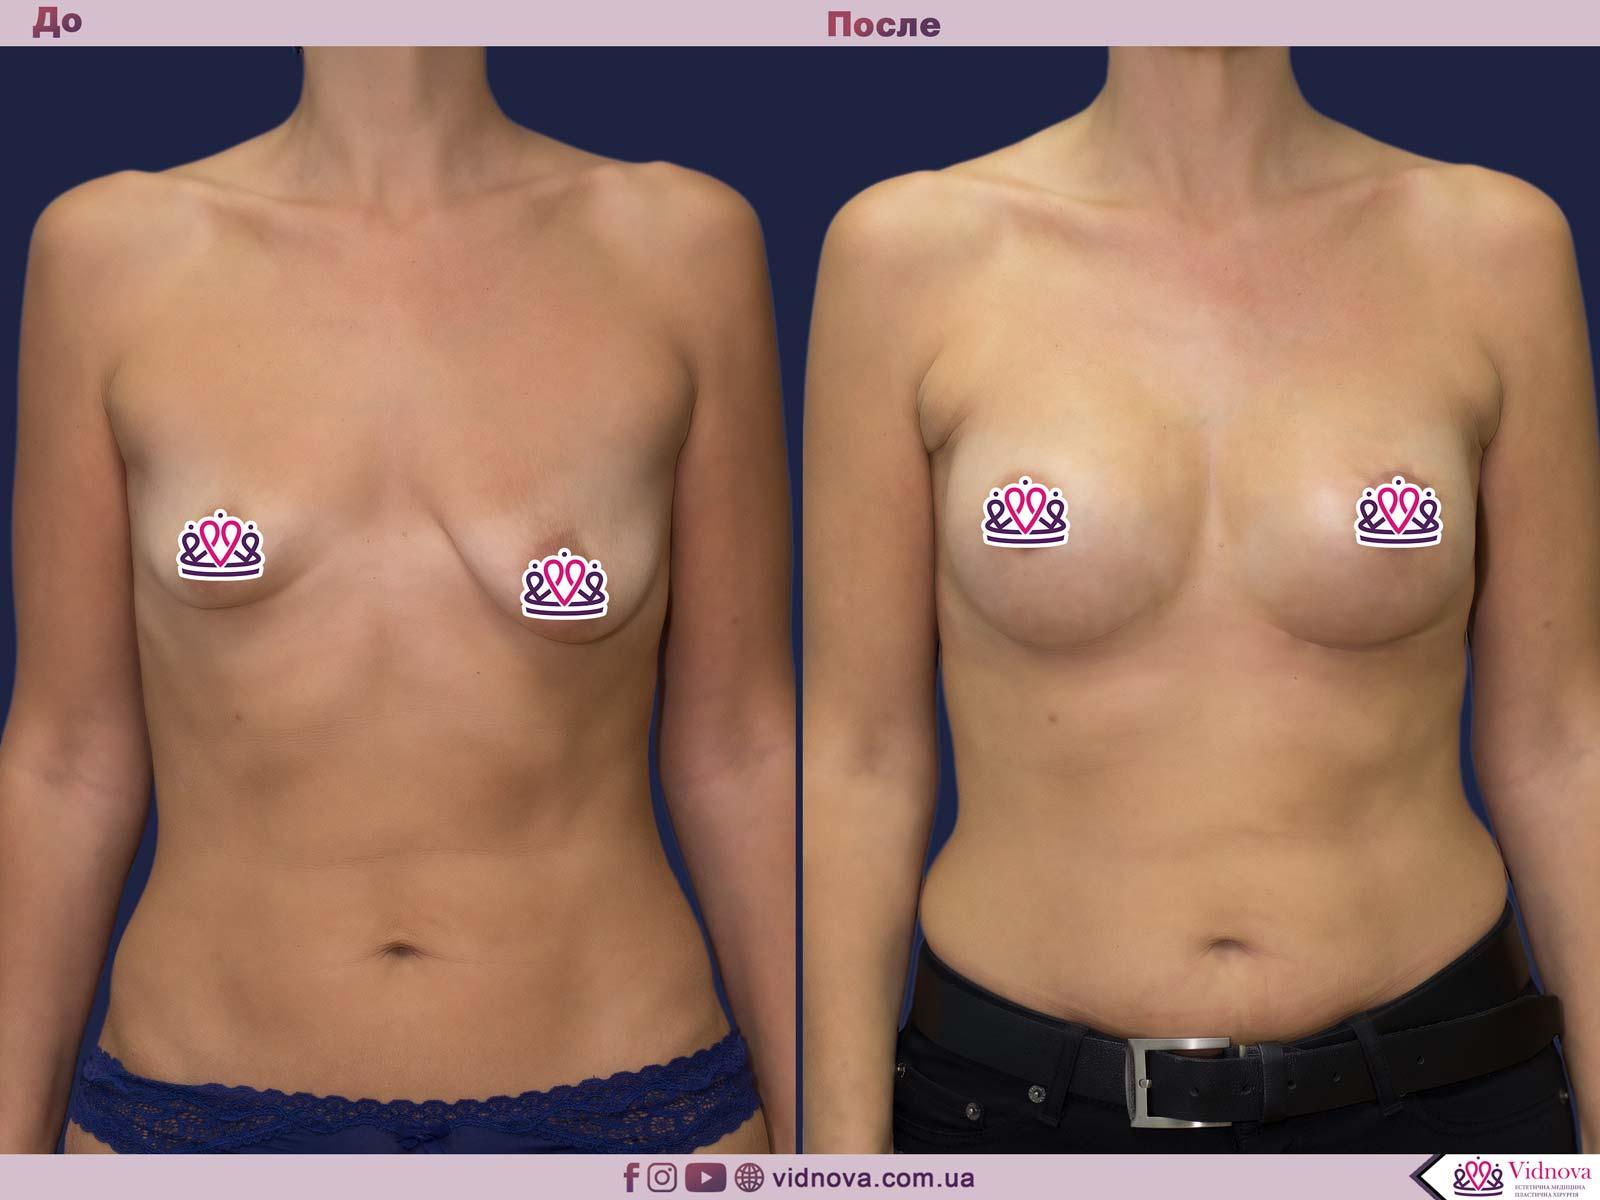 Увеличение груди: Фото ДО и ПОСЛЕ - Пример №74-1 - Клиника Vidnova